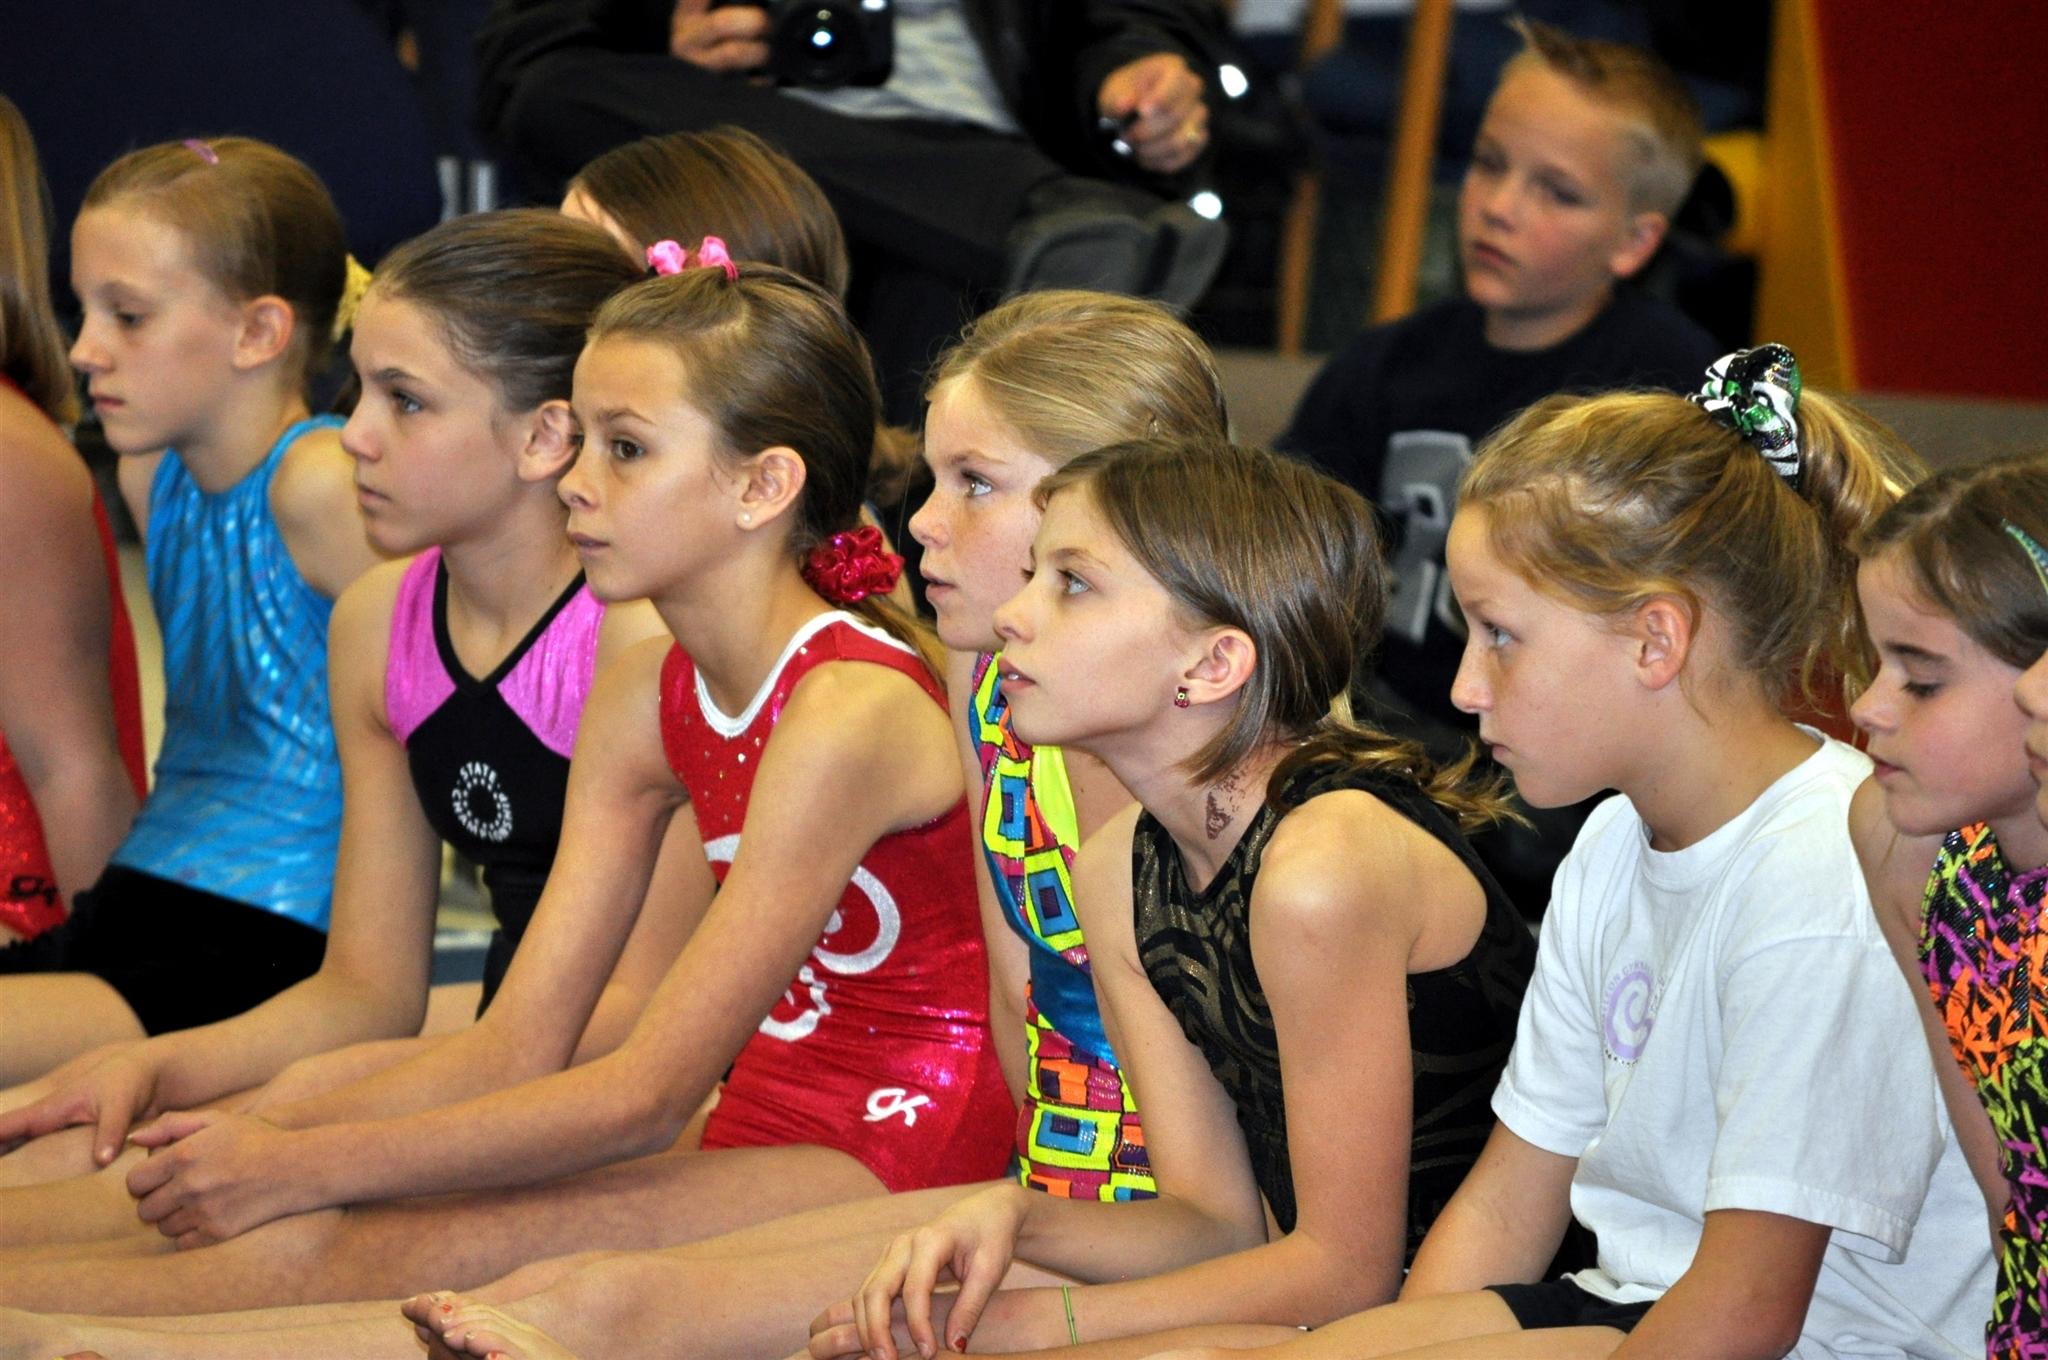 Bela-Karolyi-visits-Chameleon-Gymnastics